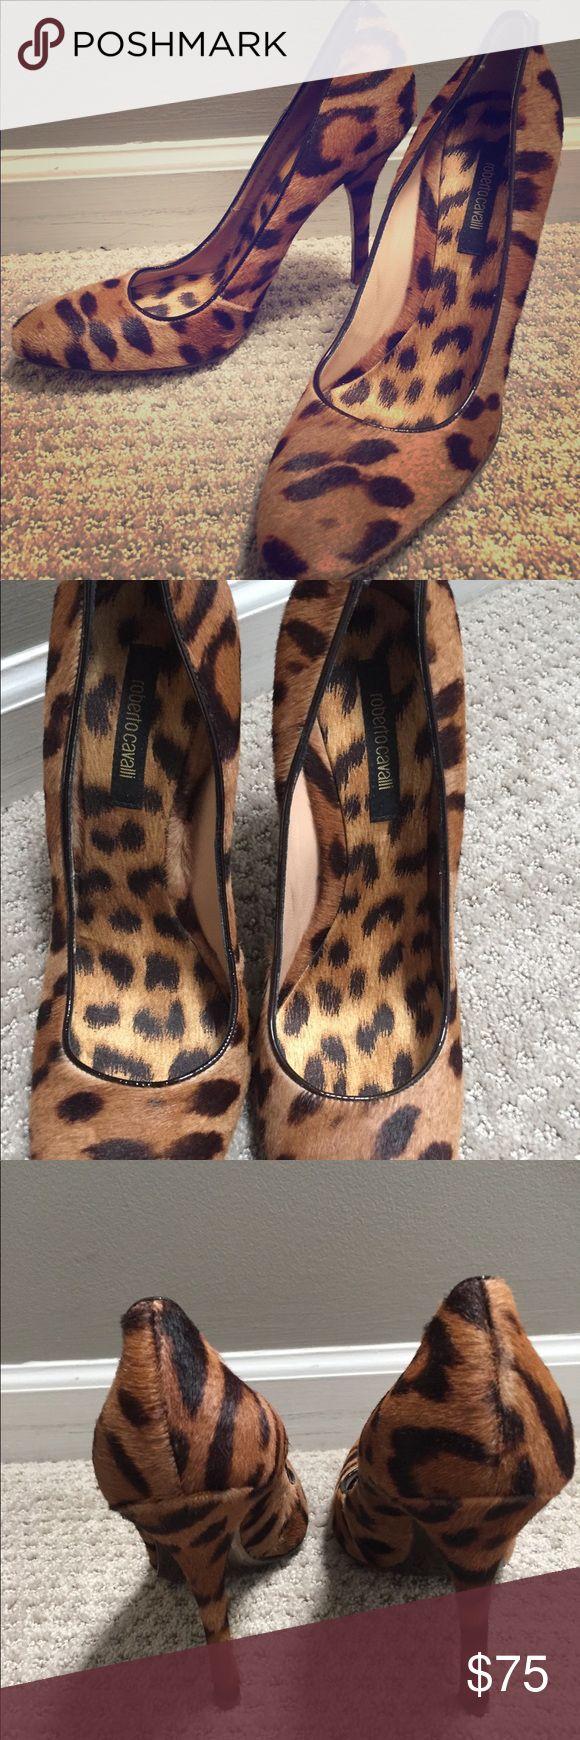 "Roberto Cavalli Pony Hair pumps Tan and brown leopard print ponyhair Roberto Cavalli round-toe pumps. 3.5-4"" heel Like new condition, worn once. Size 8 snug fit Roberto Cavalli Shoes Heels"